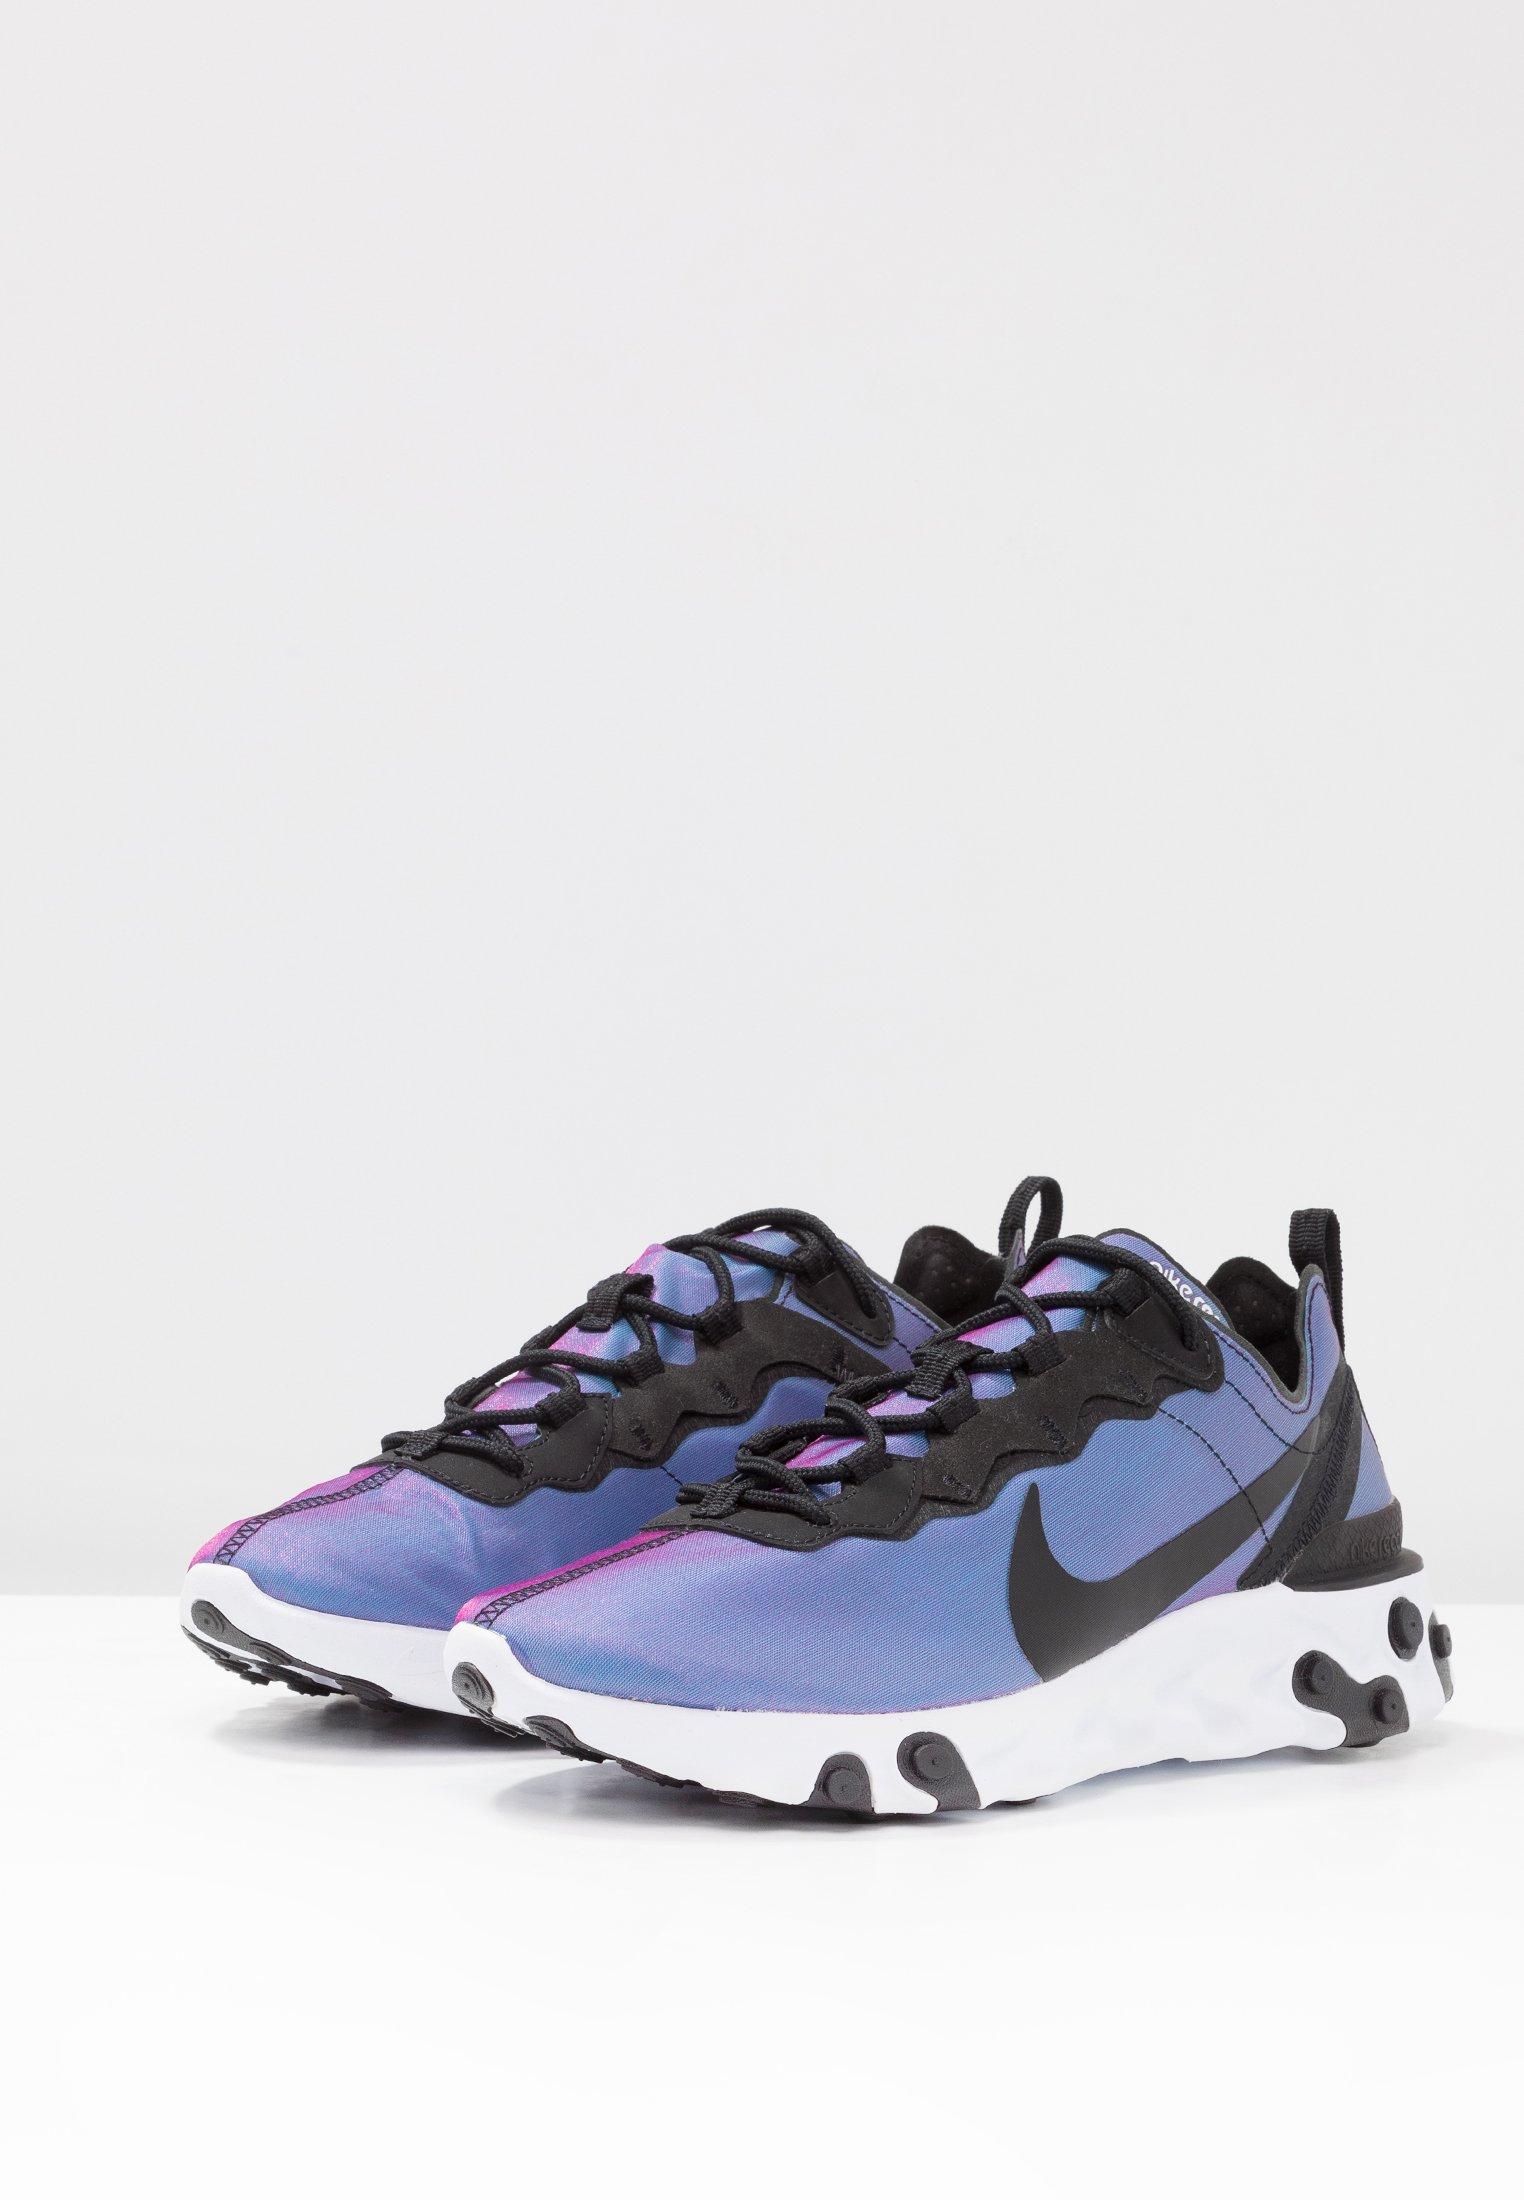 active Sportswear Basses React Element 55Baskets white Nike Black Pink HDE9b2IeWY